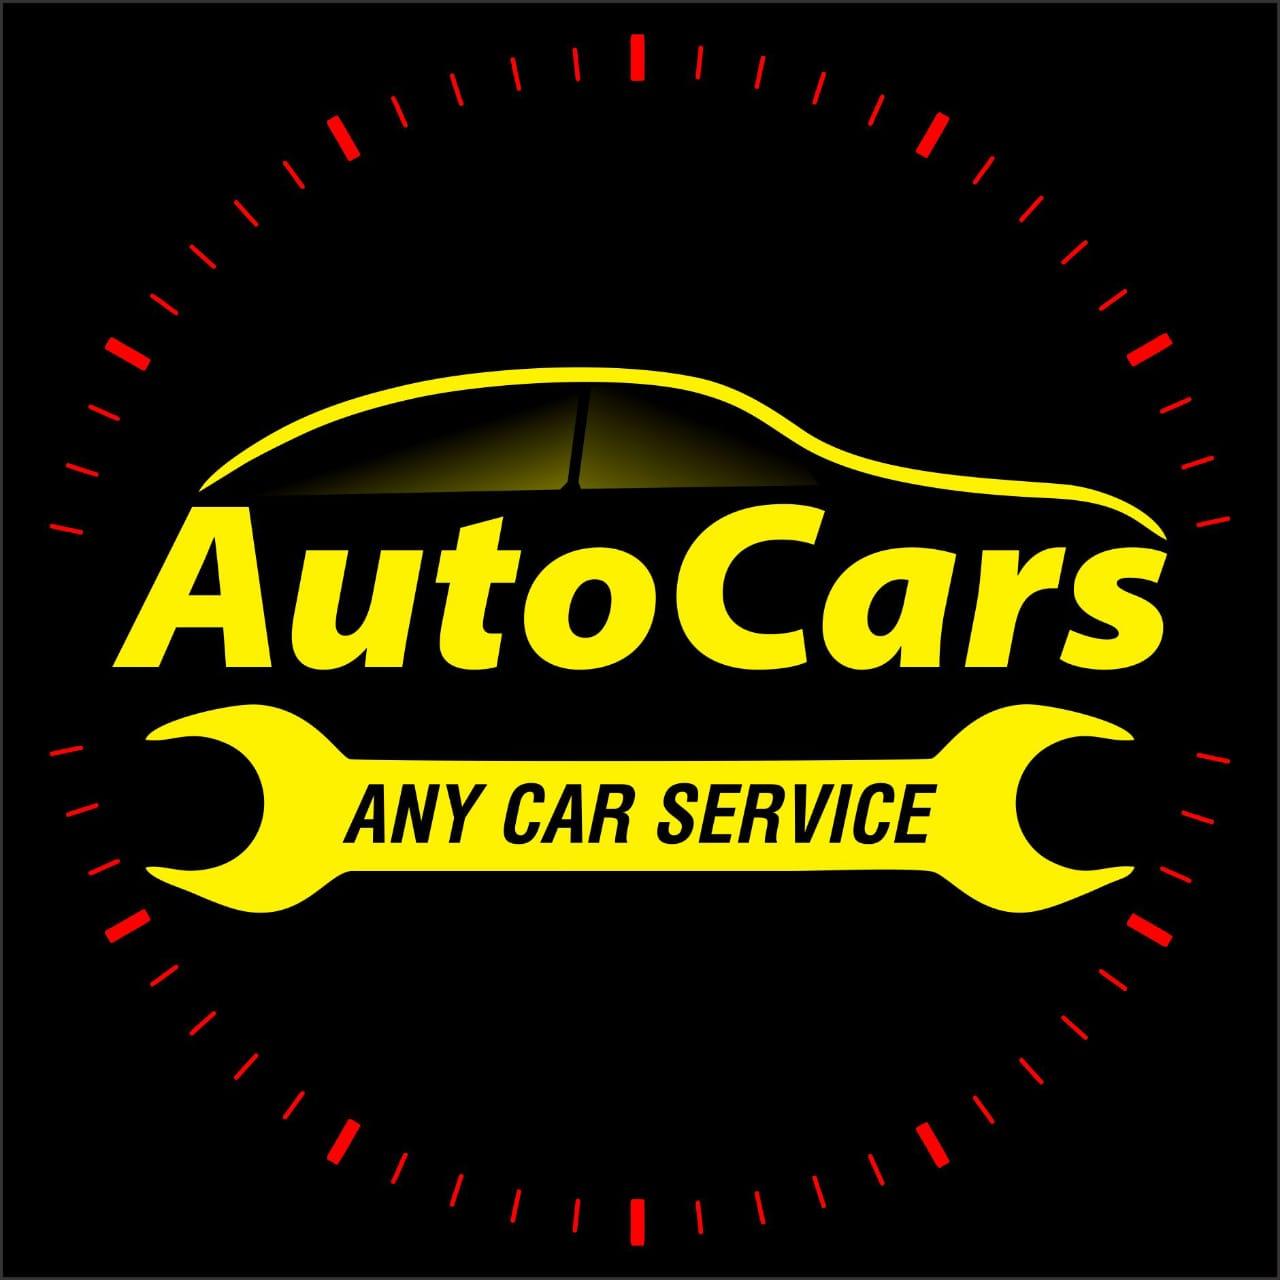 Auto Cars Services_image0